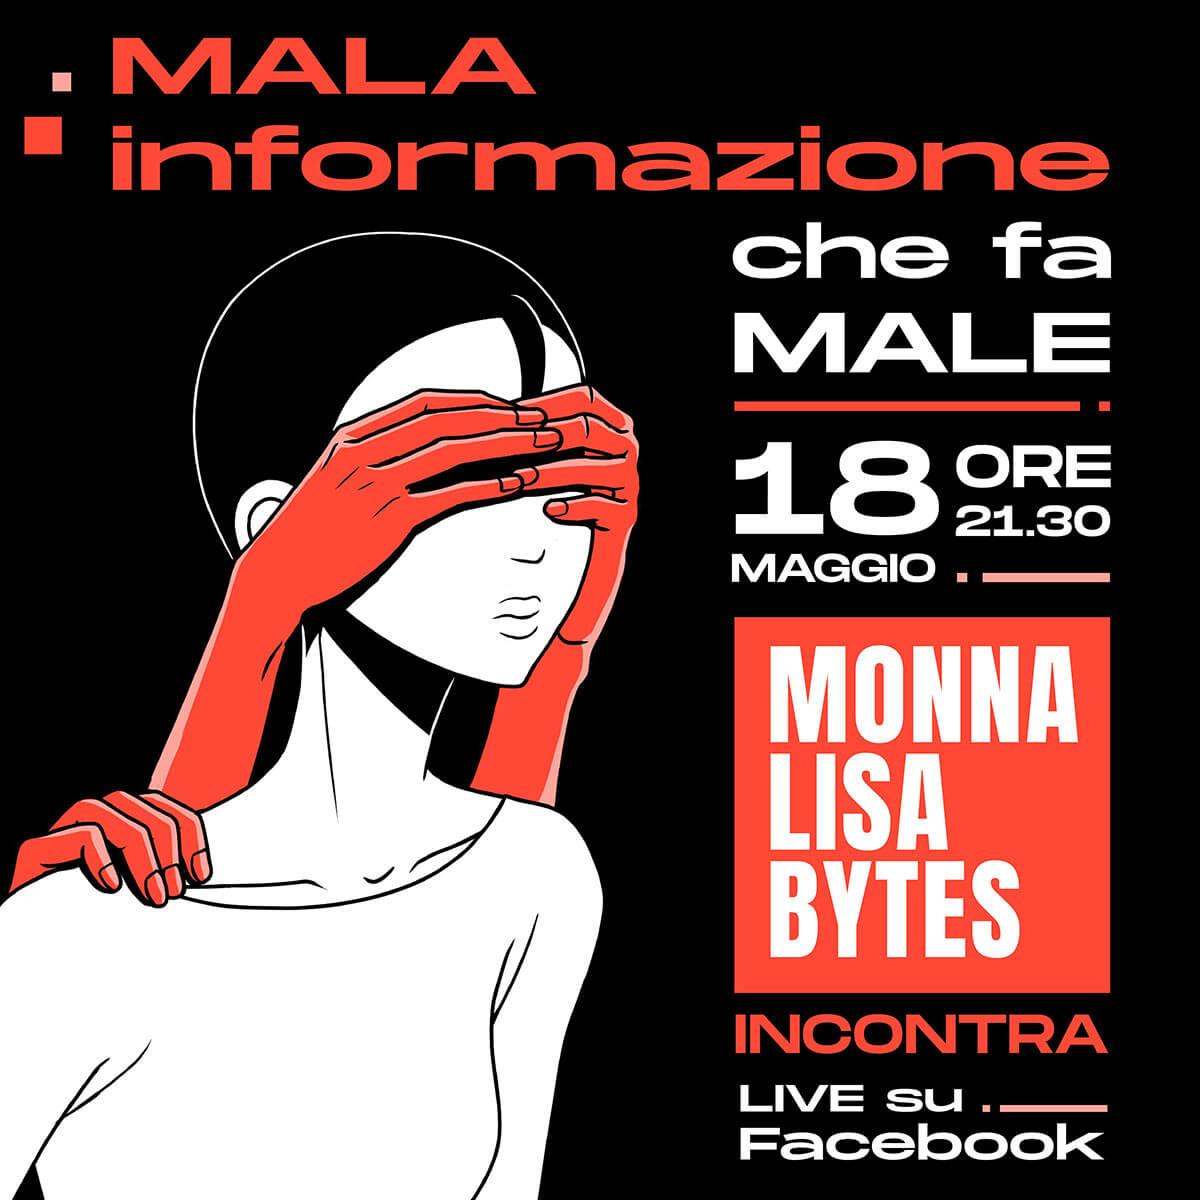 Monnalisa_Bytes_Diretta_Facebook_Mala_Informazione